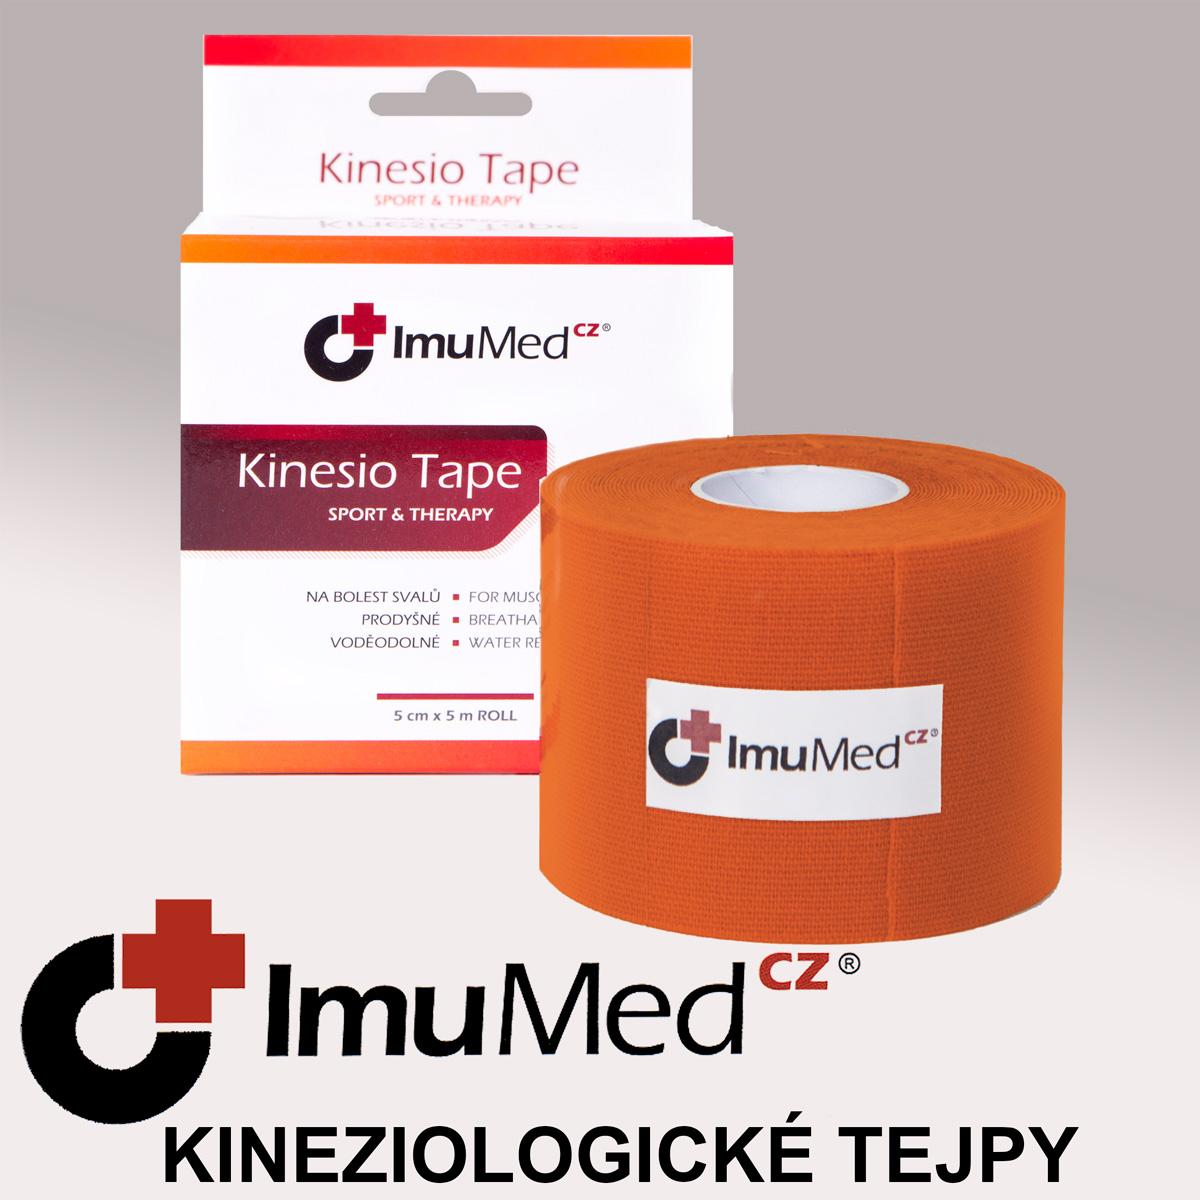 ImuMedCZ Kinesio Tape, tejpovací páska oranžová 5 cm x 5 m ImuMedCZ Kineziologické tejpy